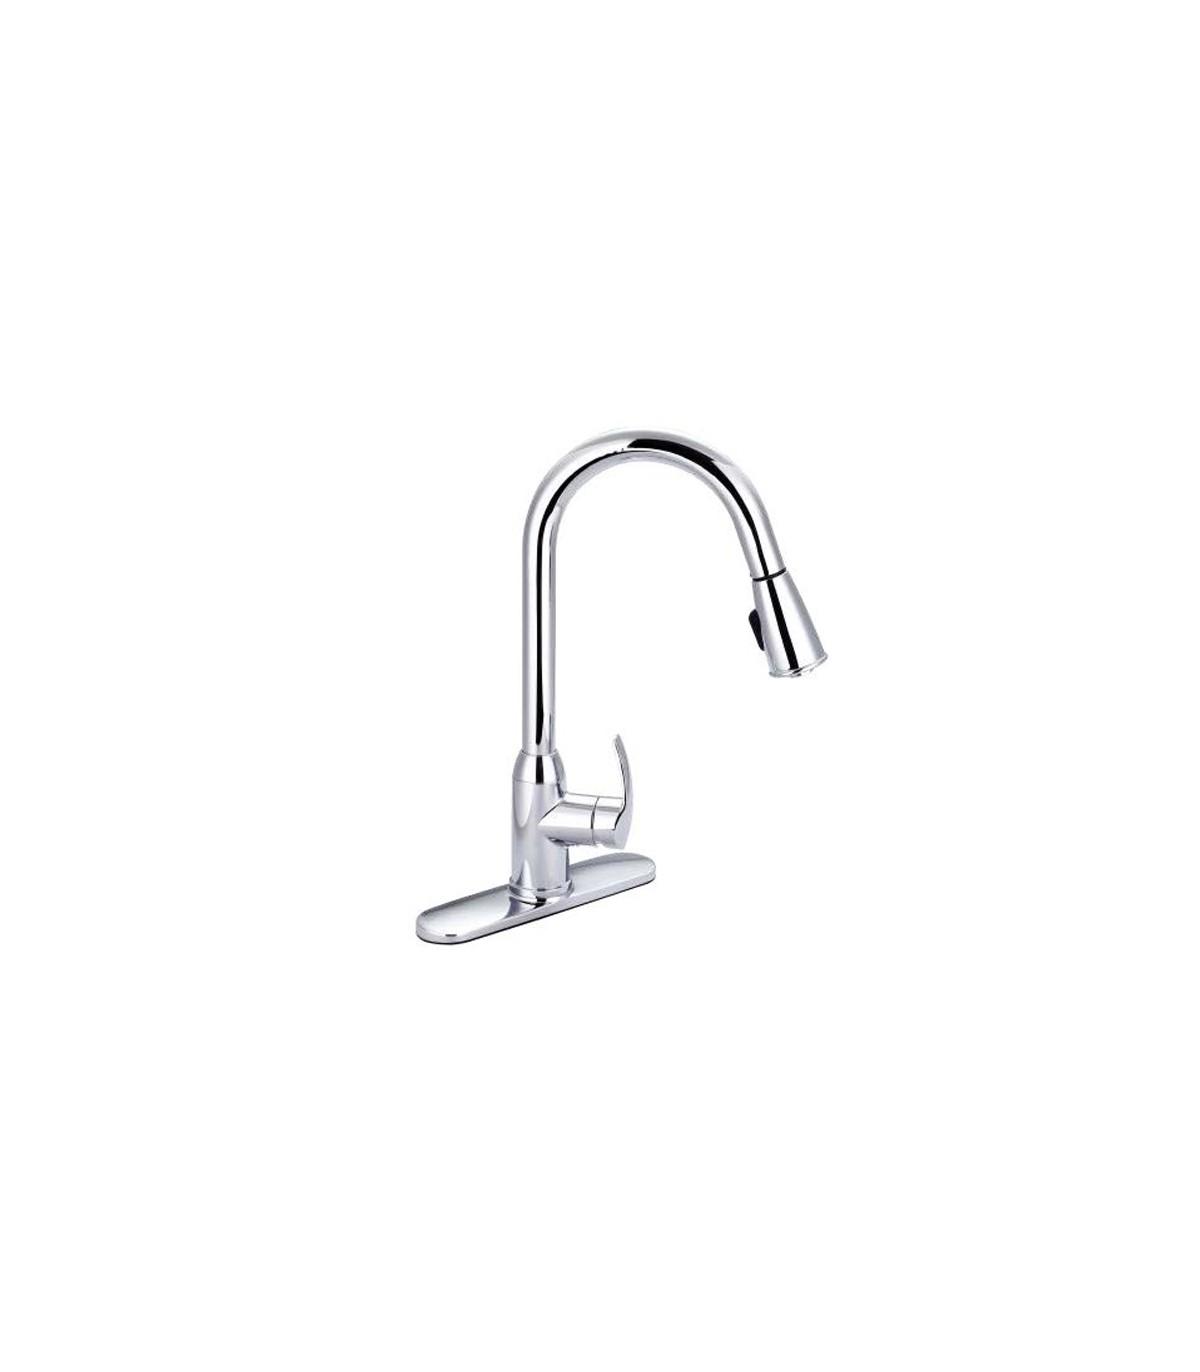 LS-KF4 Kitchen Faucet Chrome Brushed Nickel